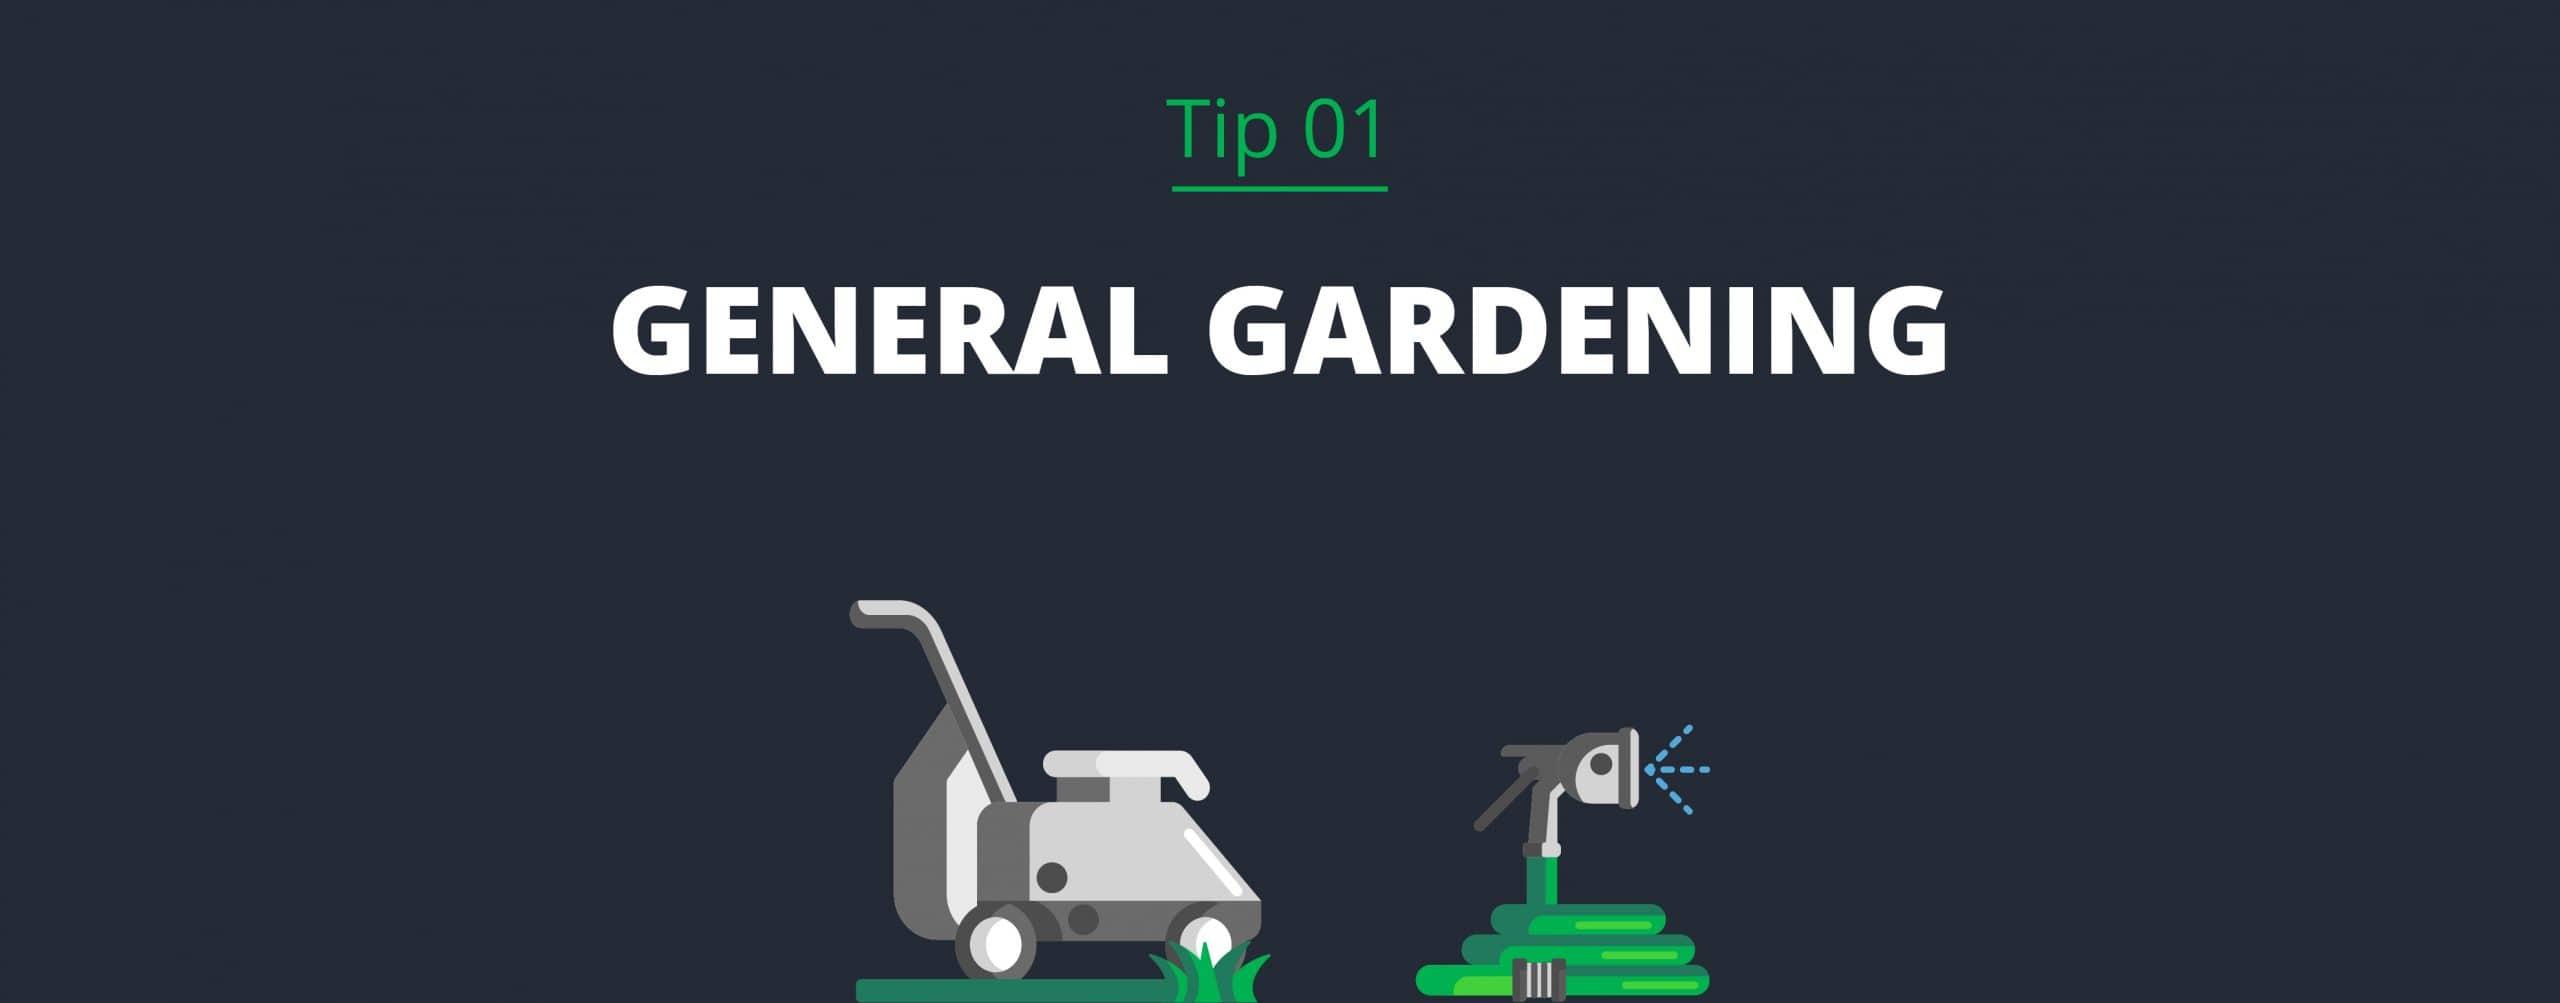 Arb Garden Guide Headings-01